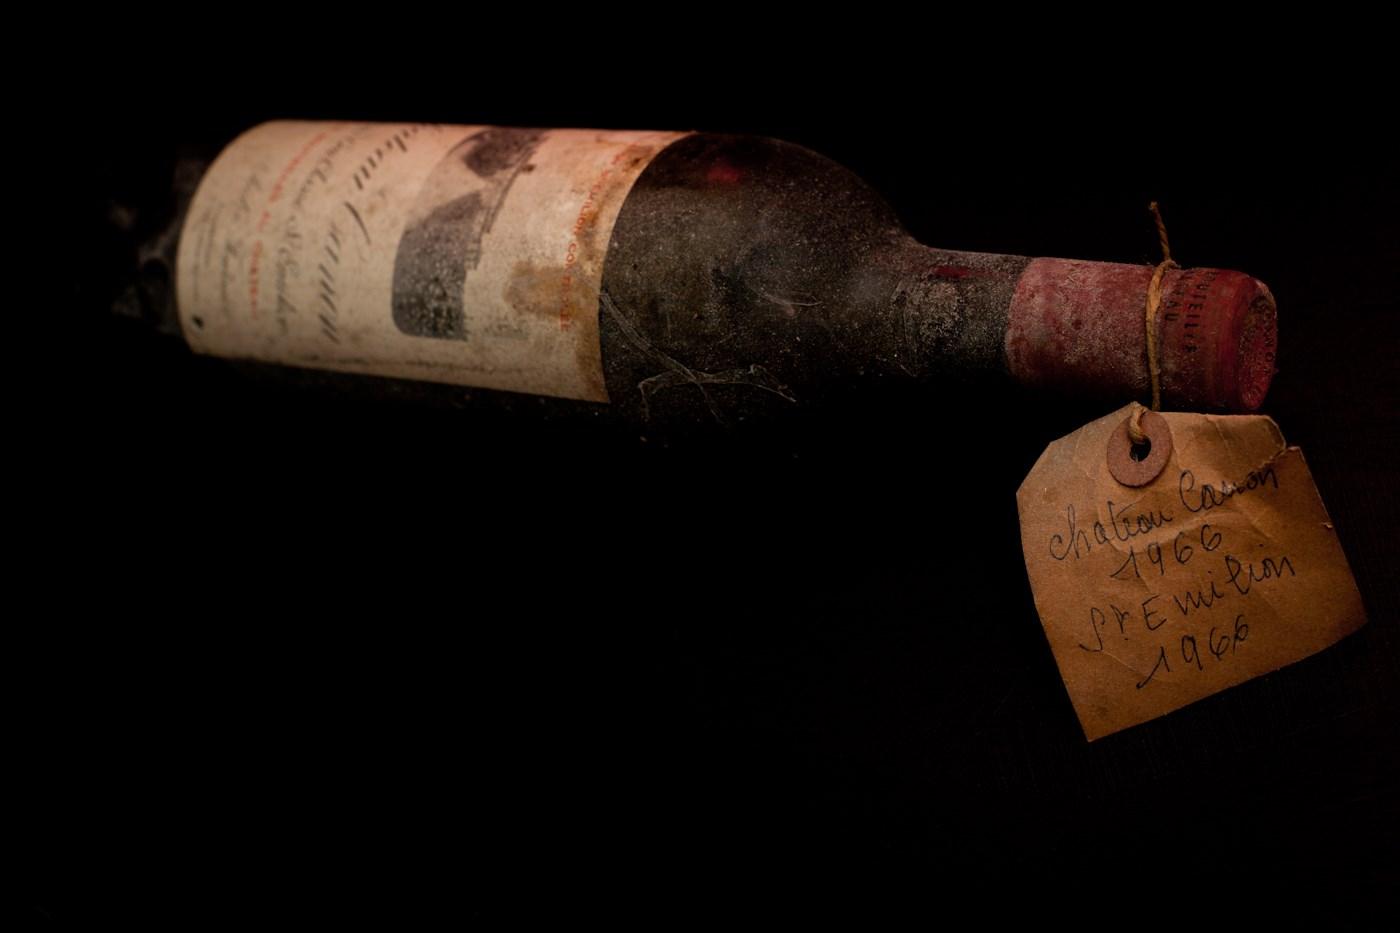 Vin chateau canon 1966